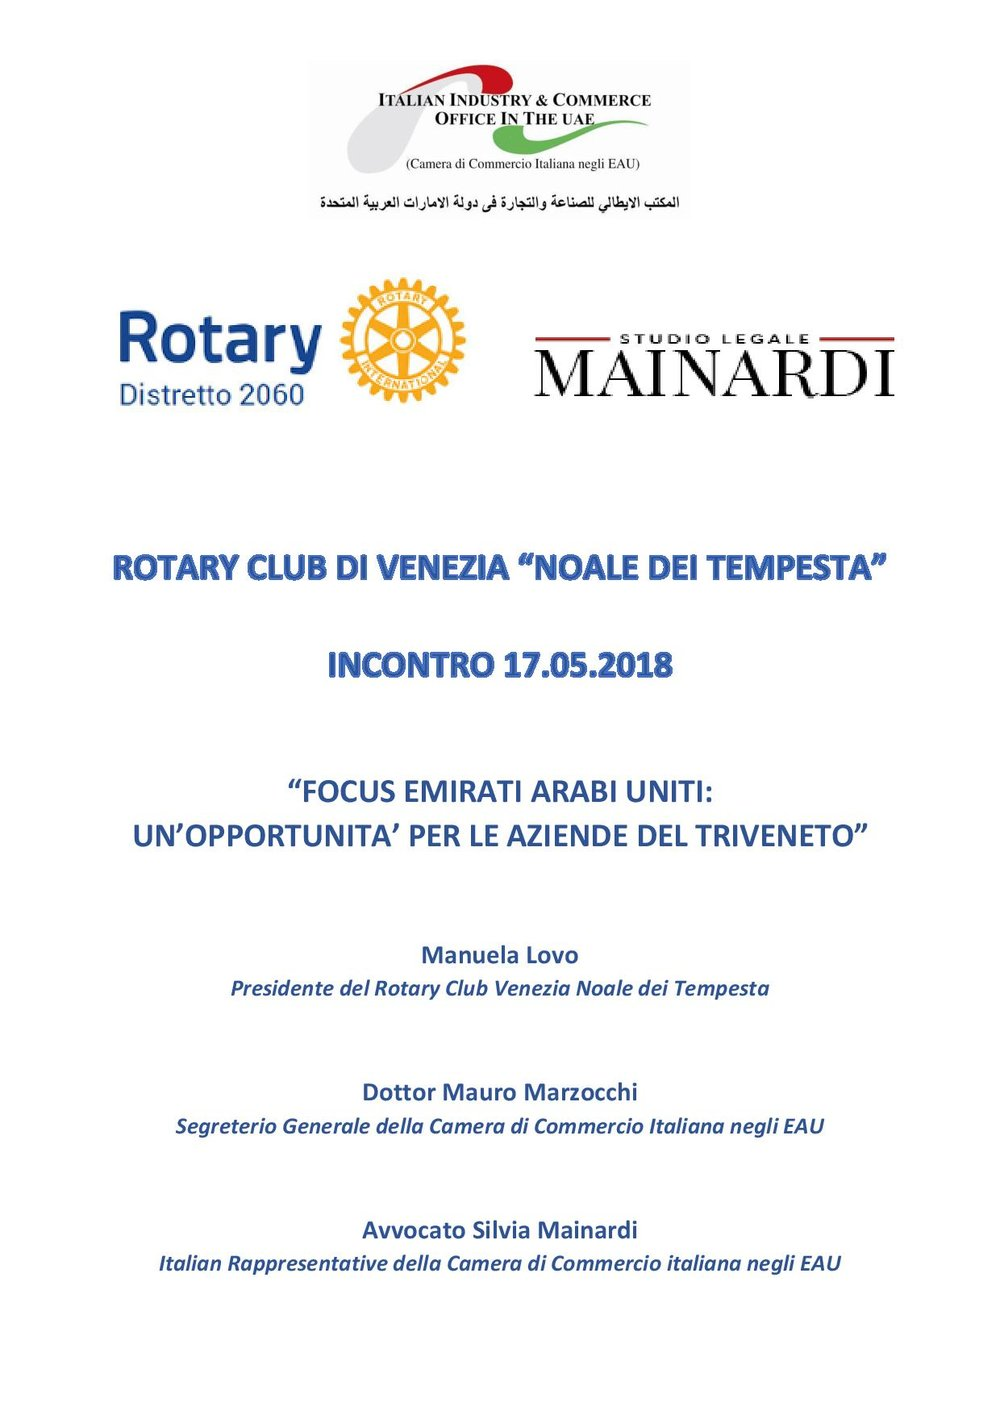 locandina incontro 17.05.2018-page-001 (1).jpg